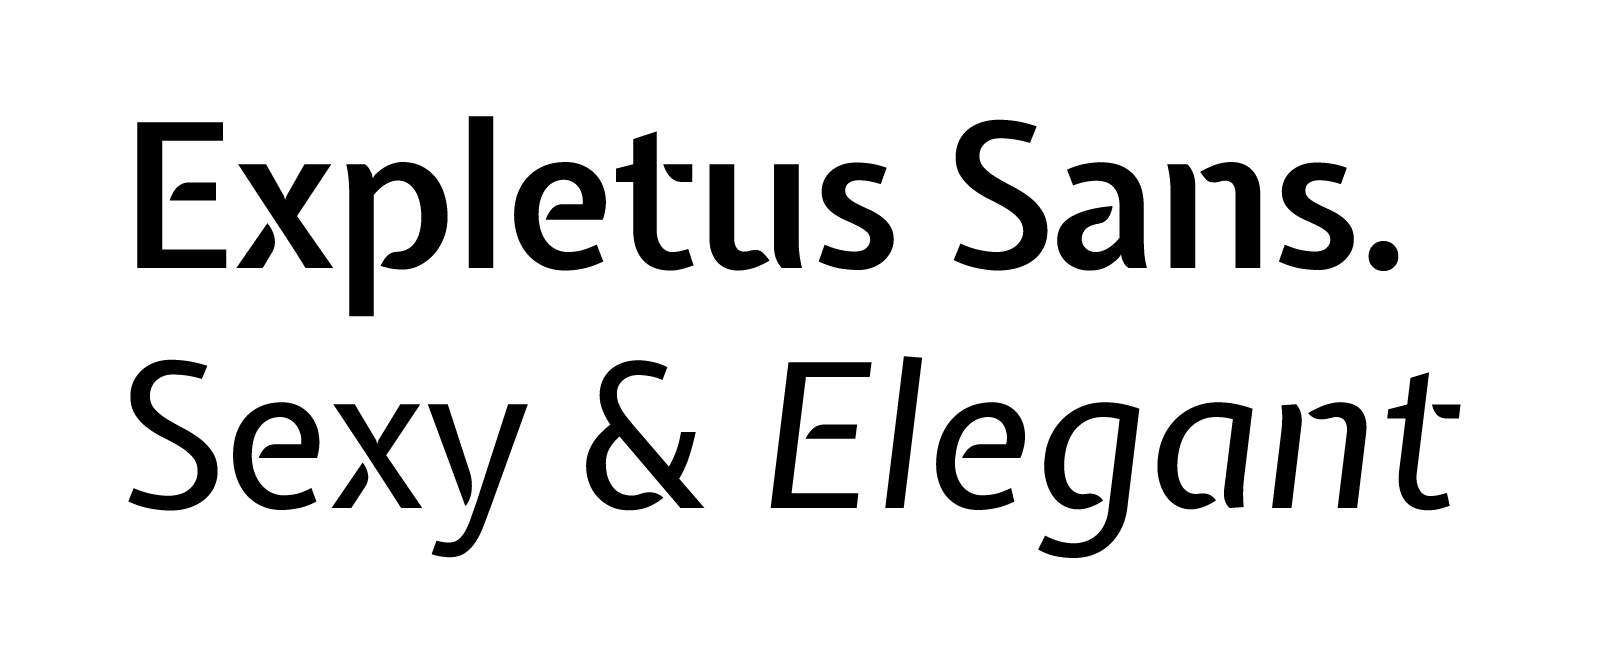 expletus-showoff_new